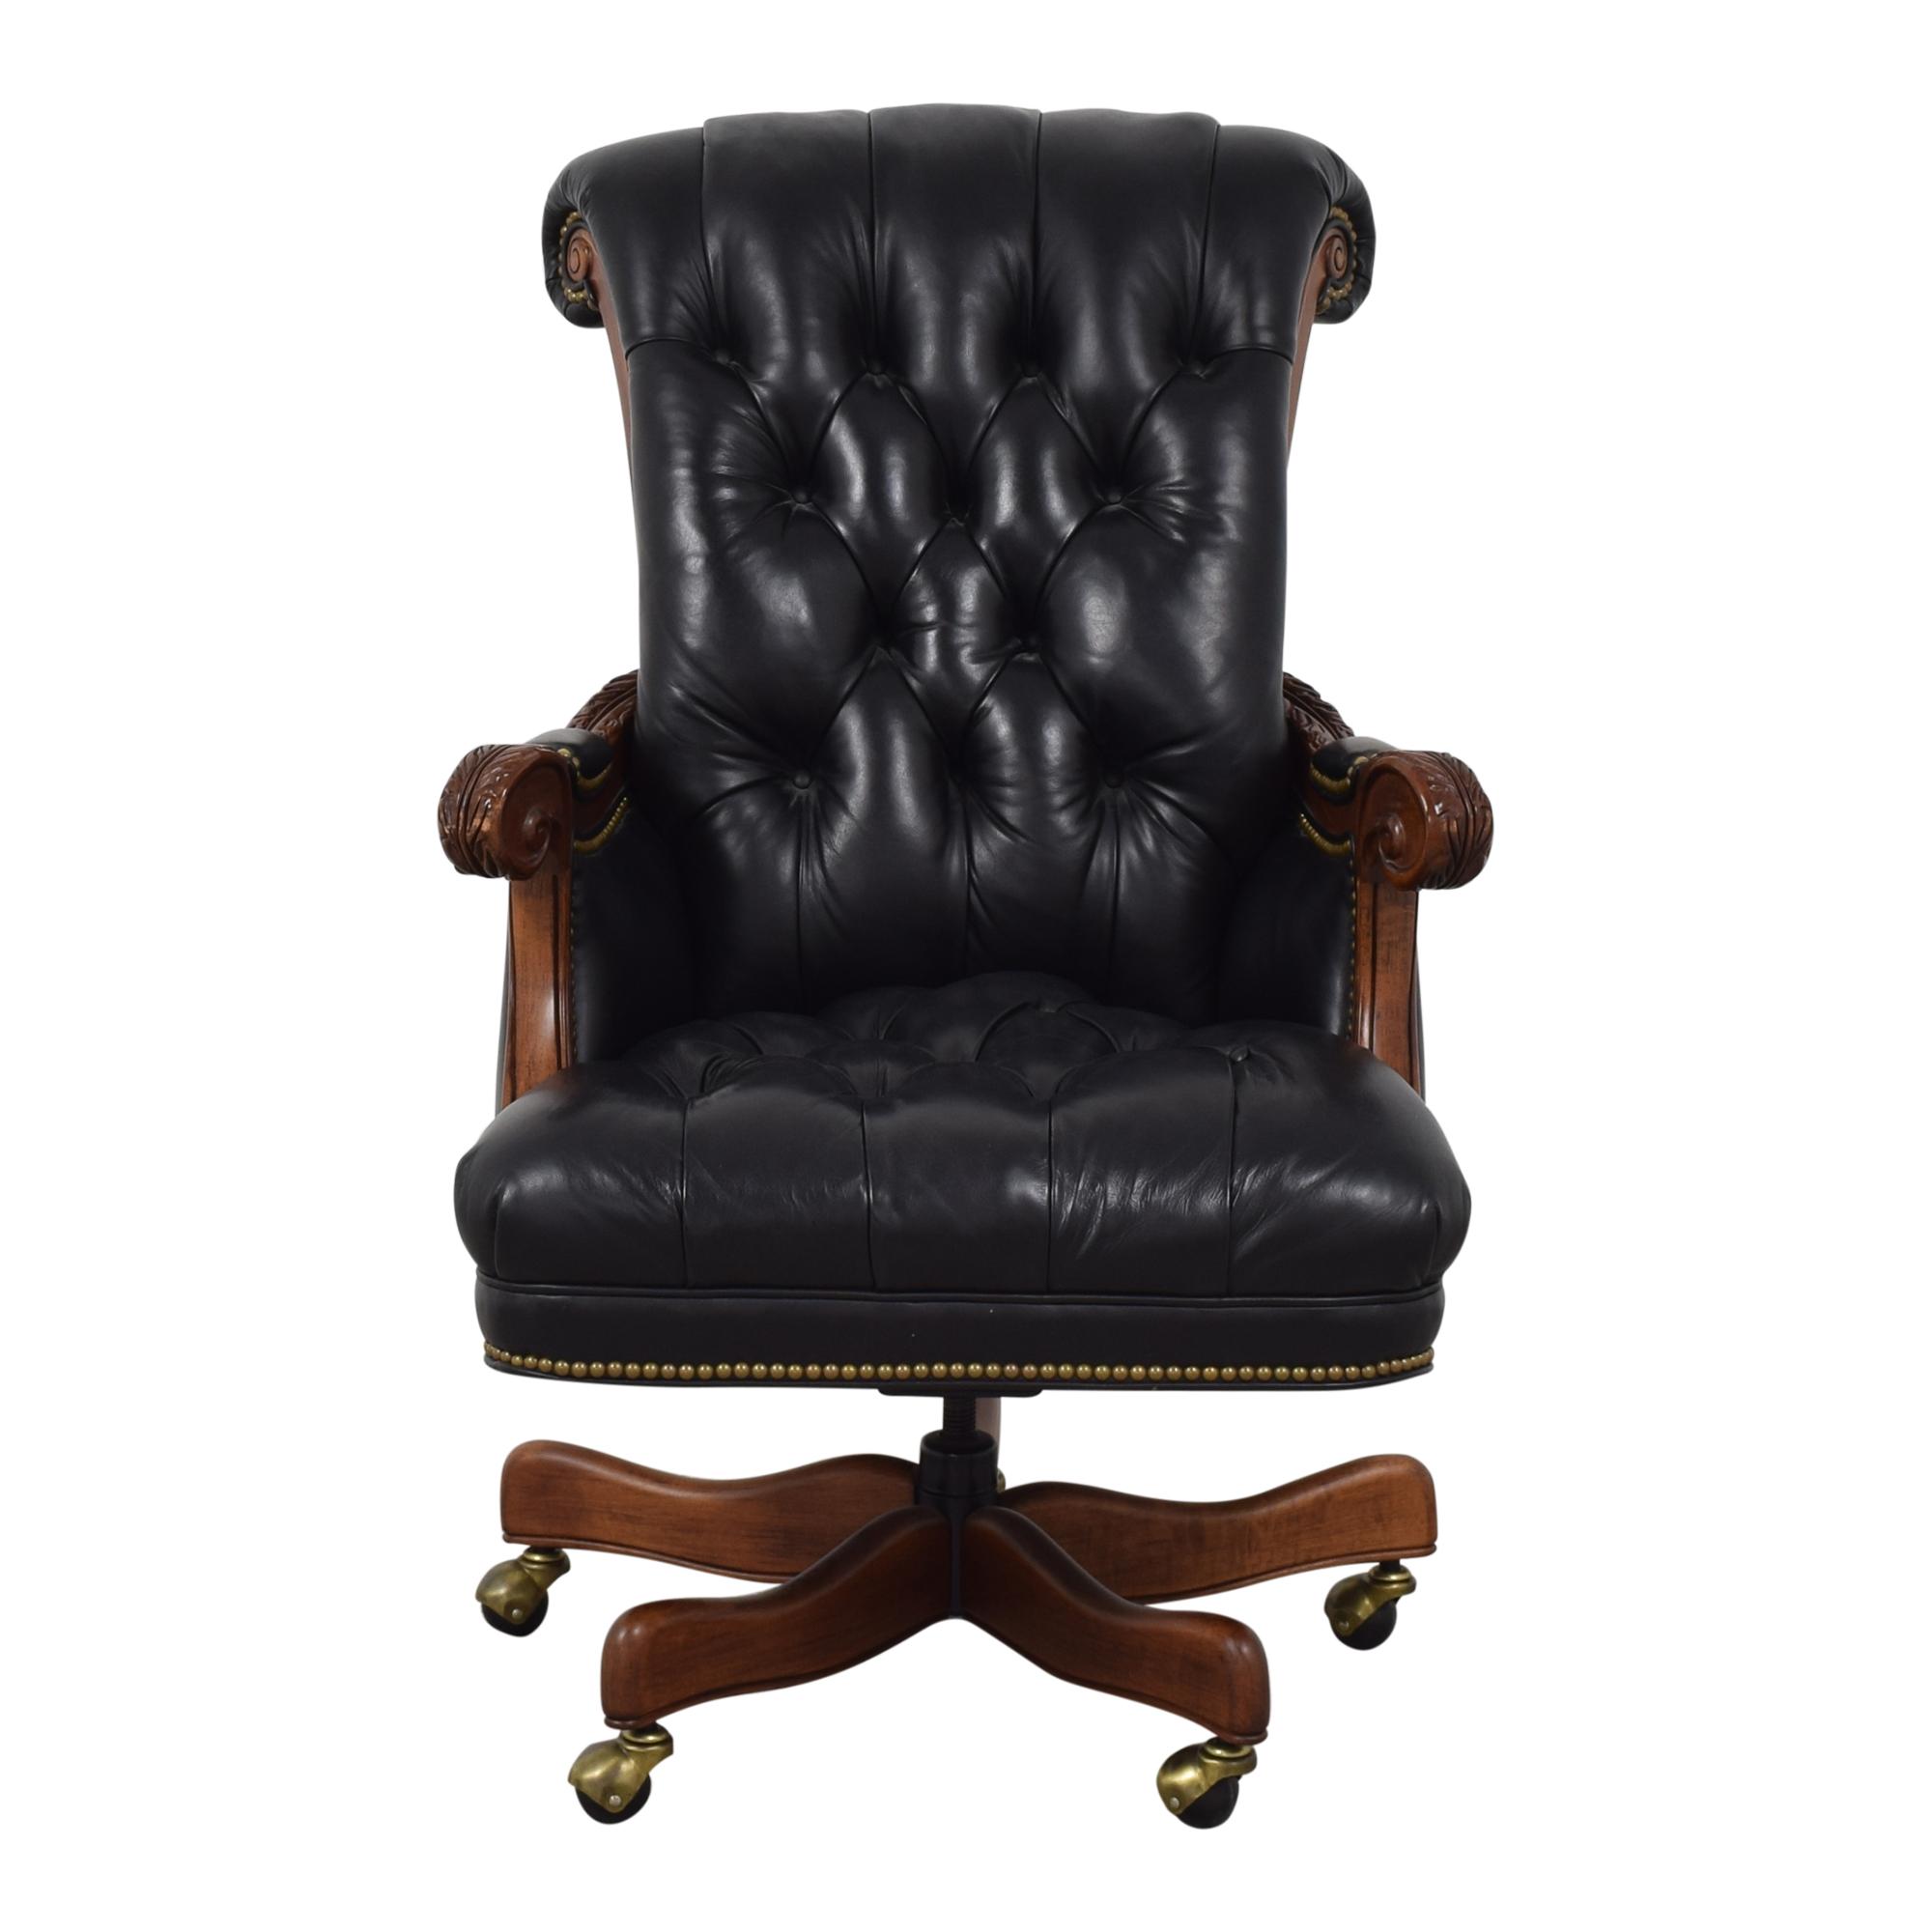 shop Hancock and Moore Hancock and Moore Patriot Swivel-Tilt Chair online